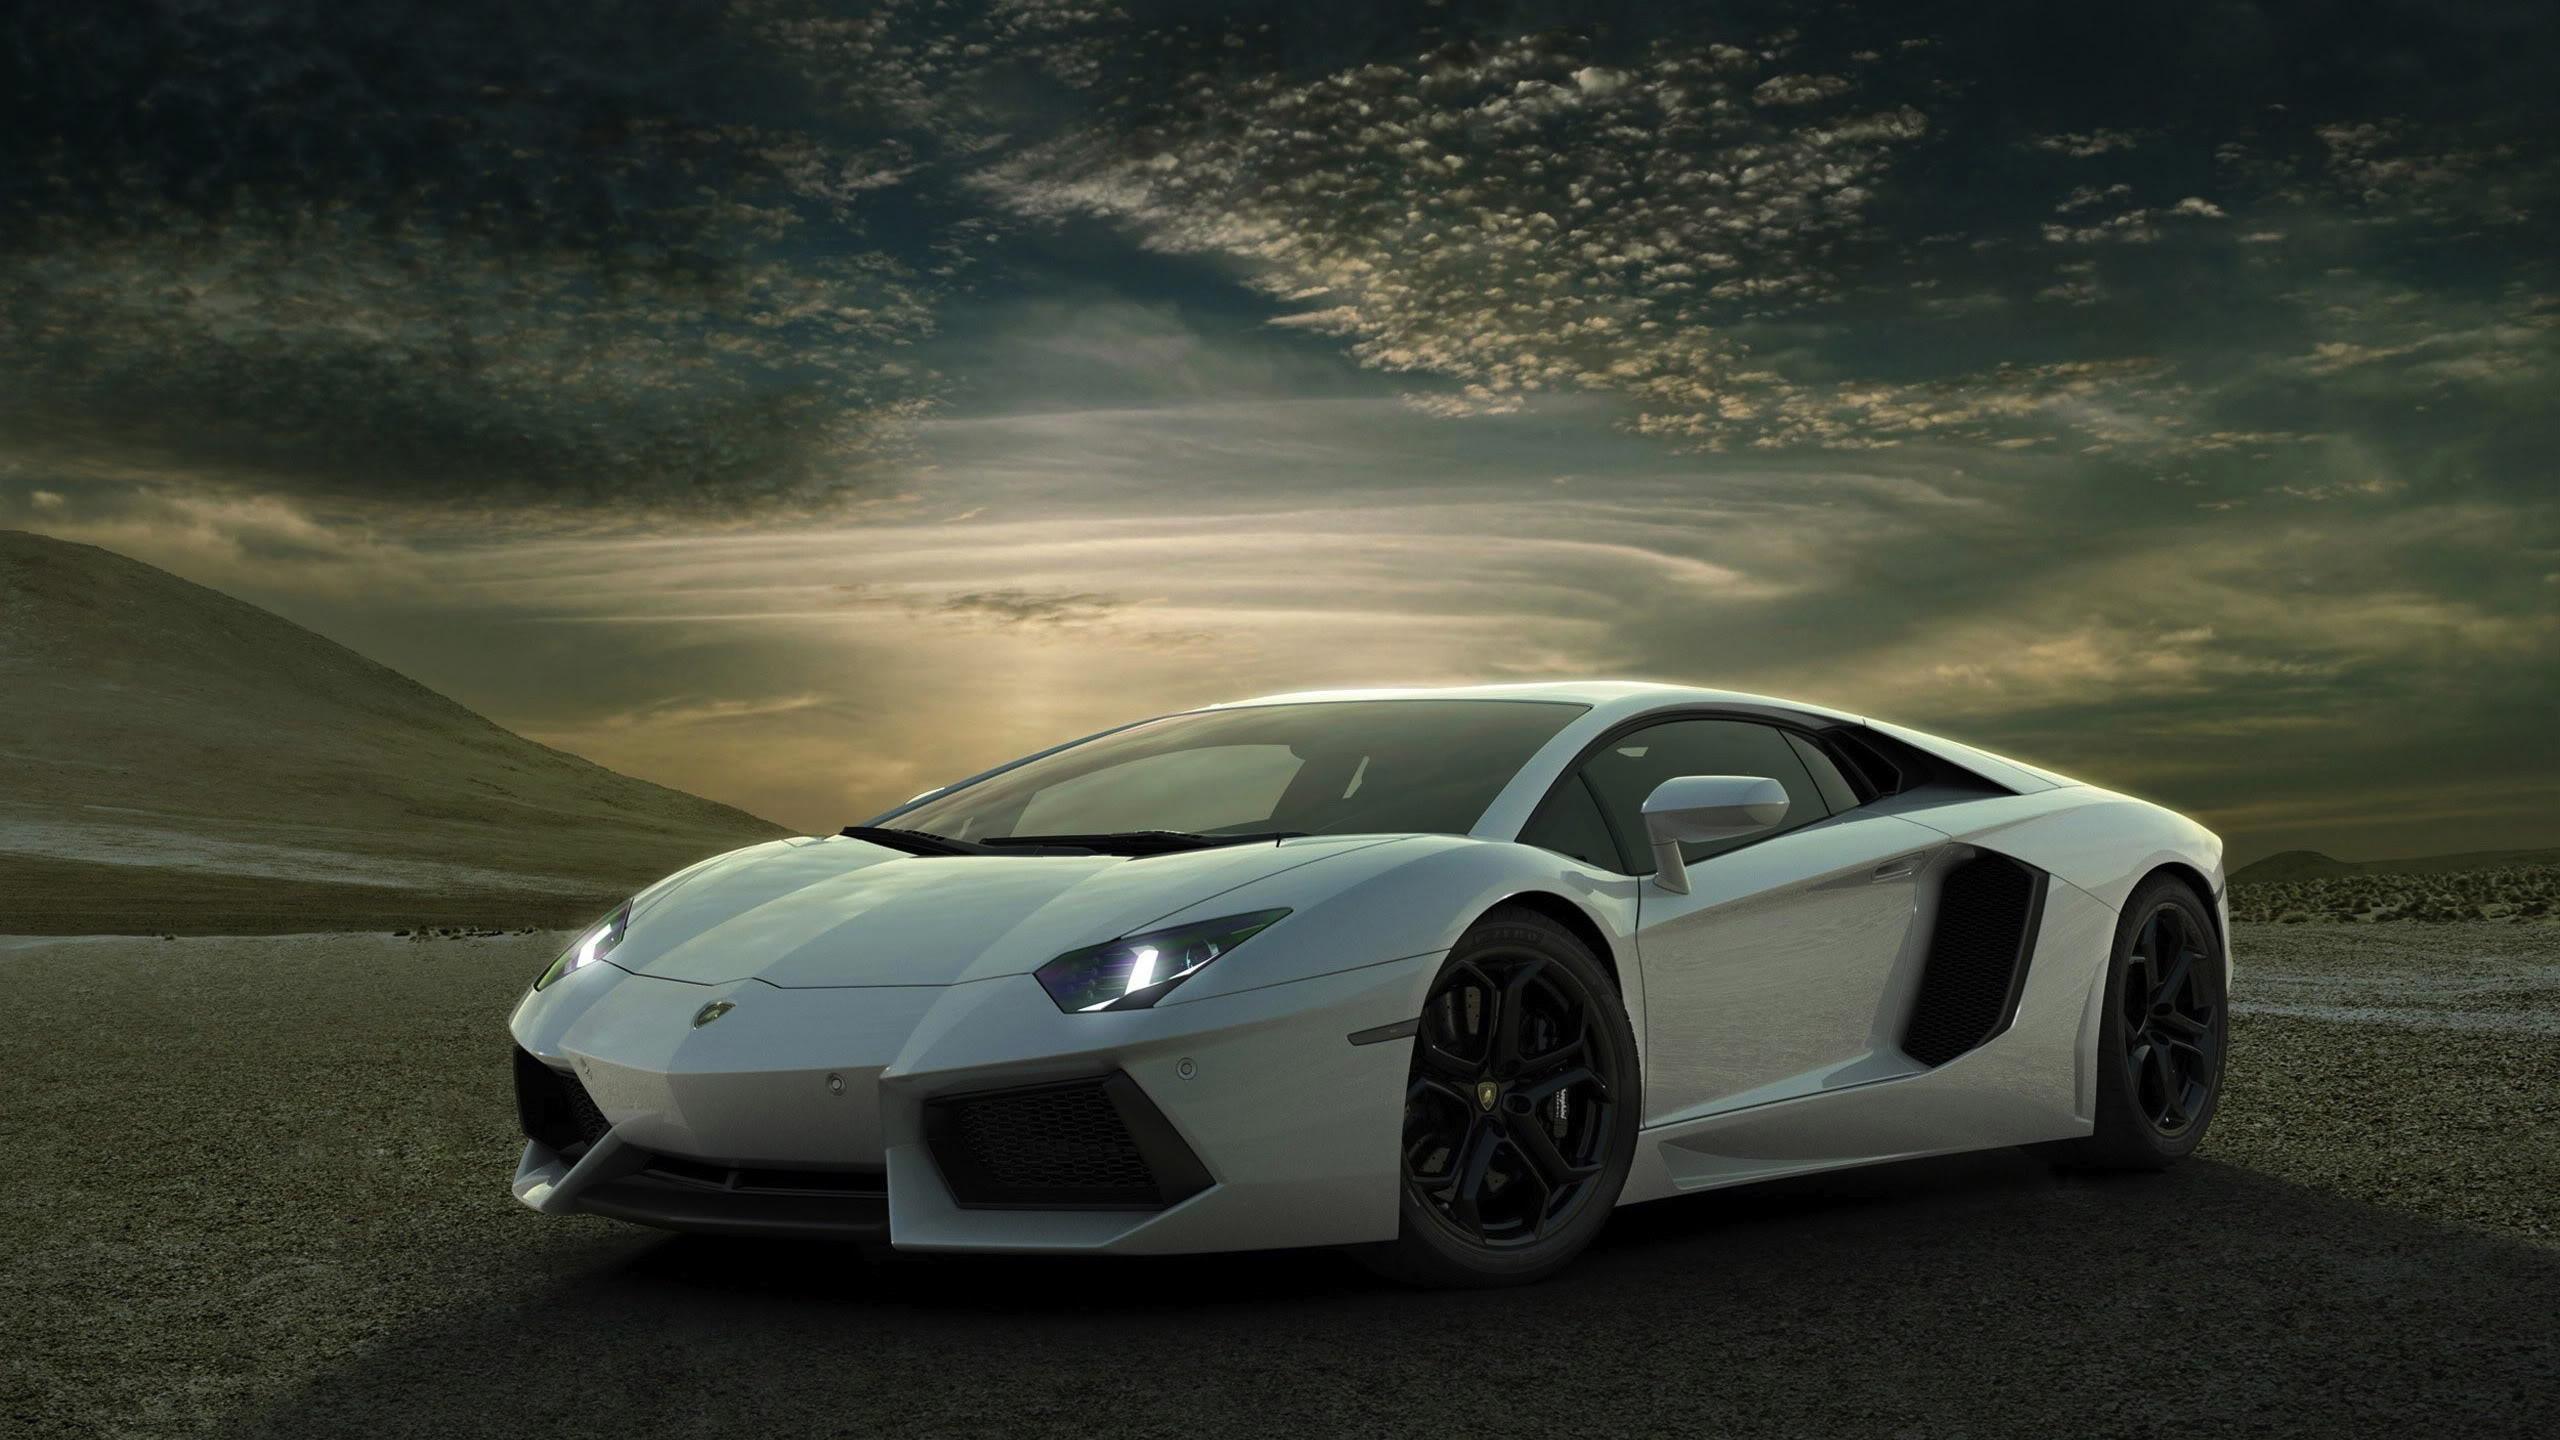 lamborghini aventador wallpapers high quality download free - Lamborghini Aventador Wallpaper Hd Widescreen